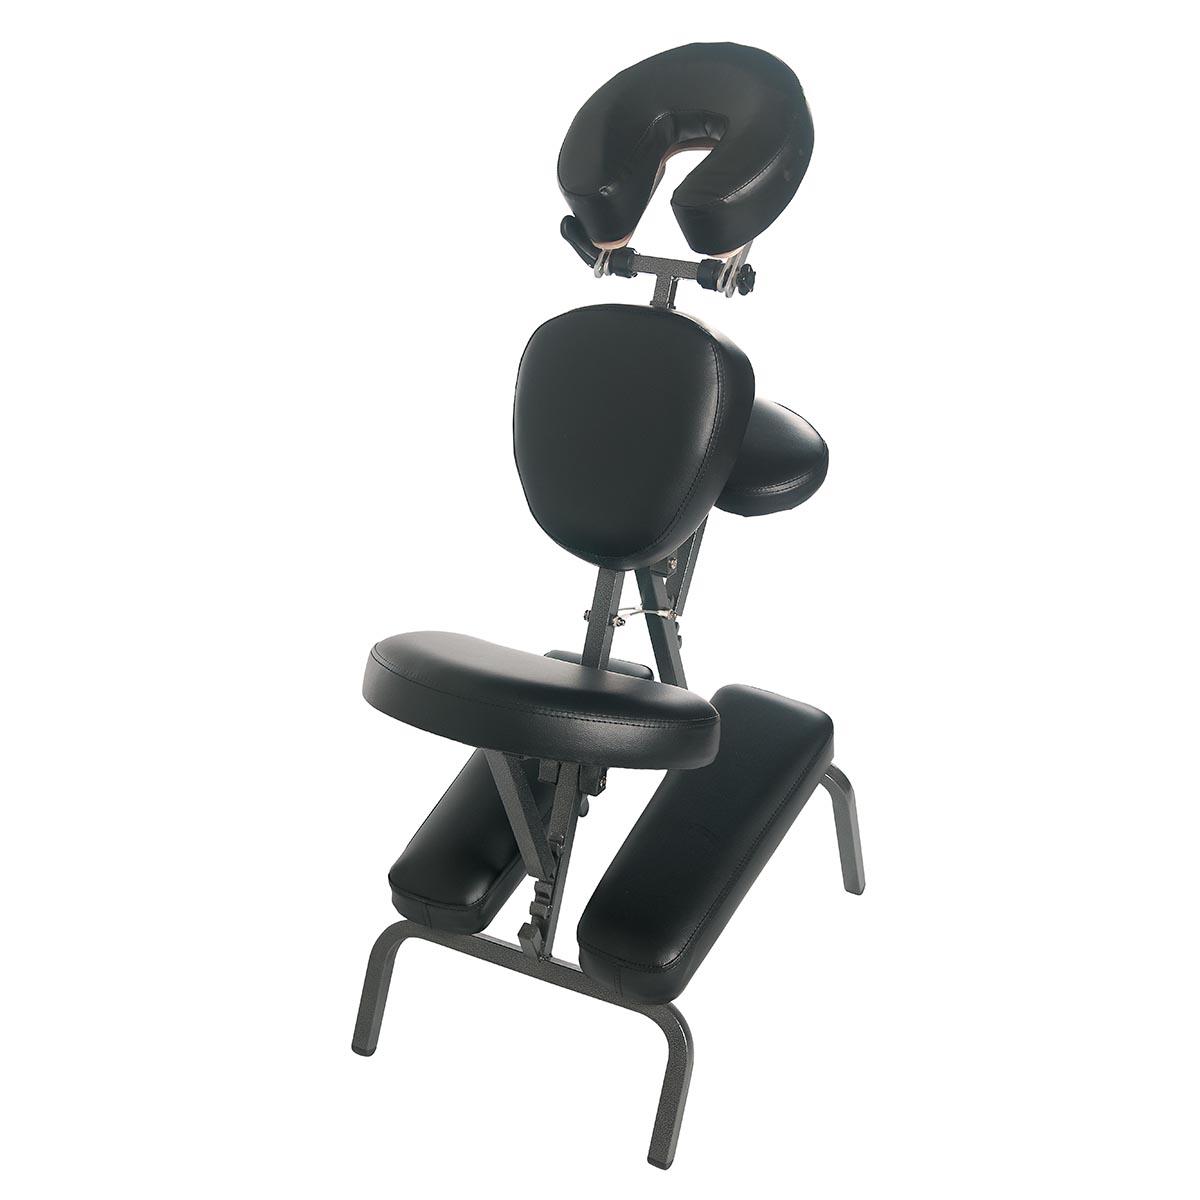 massage chair for sale. 3b pro massage chair - black for sale